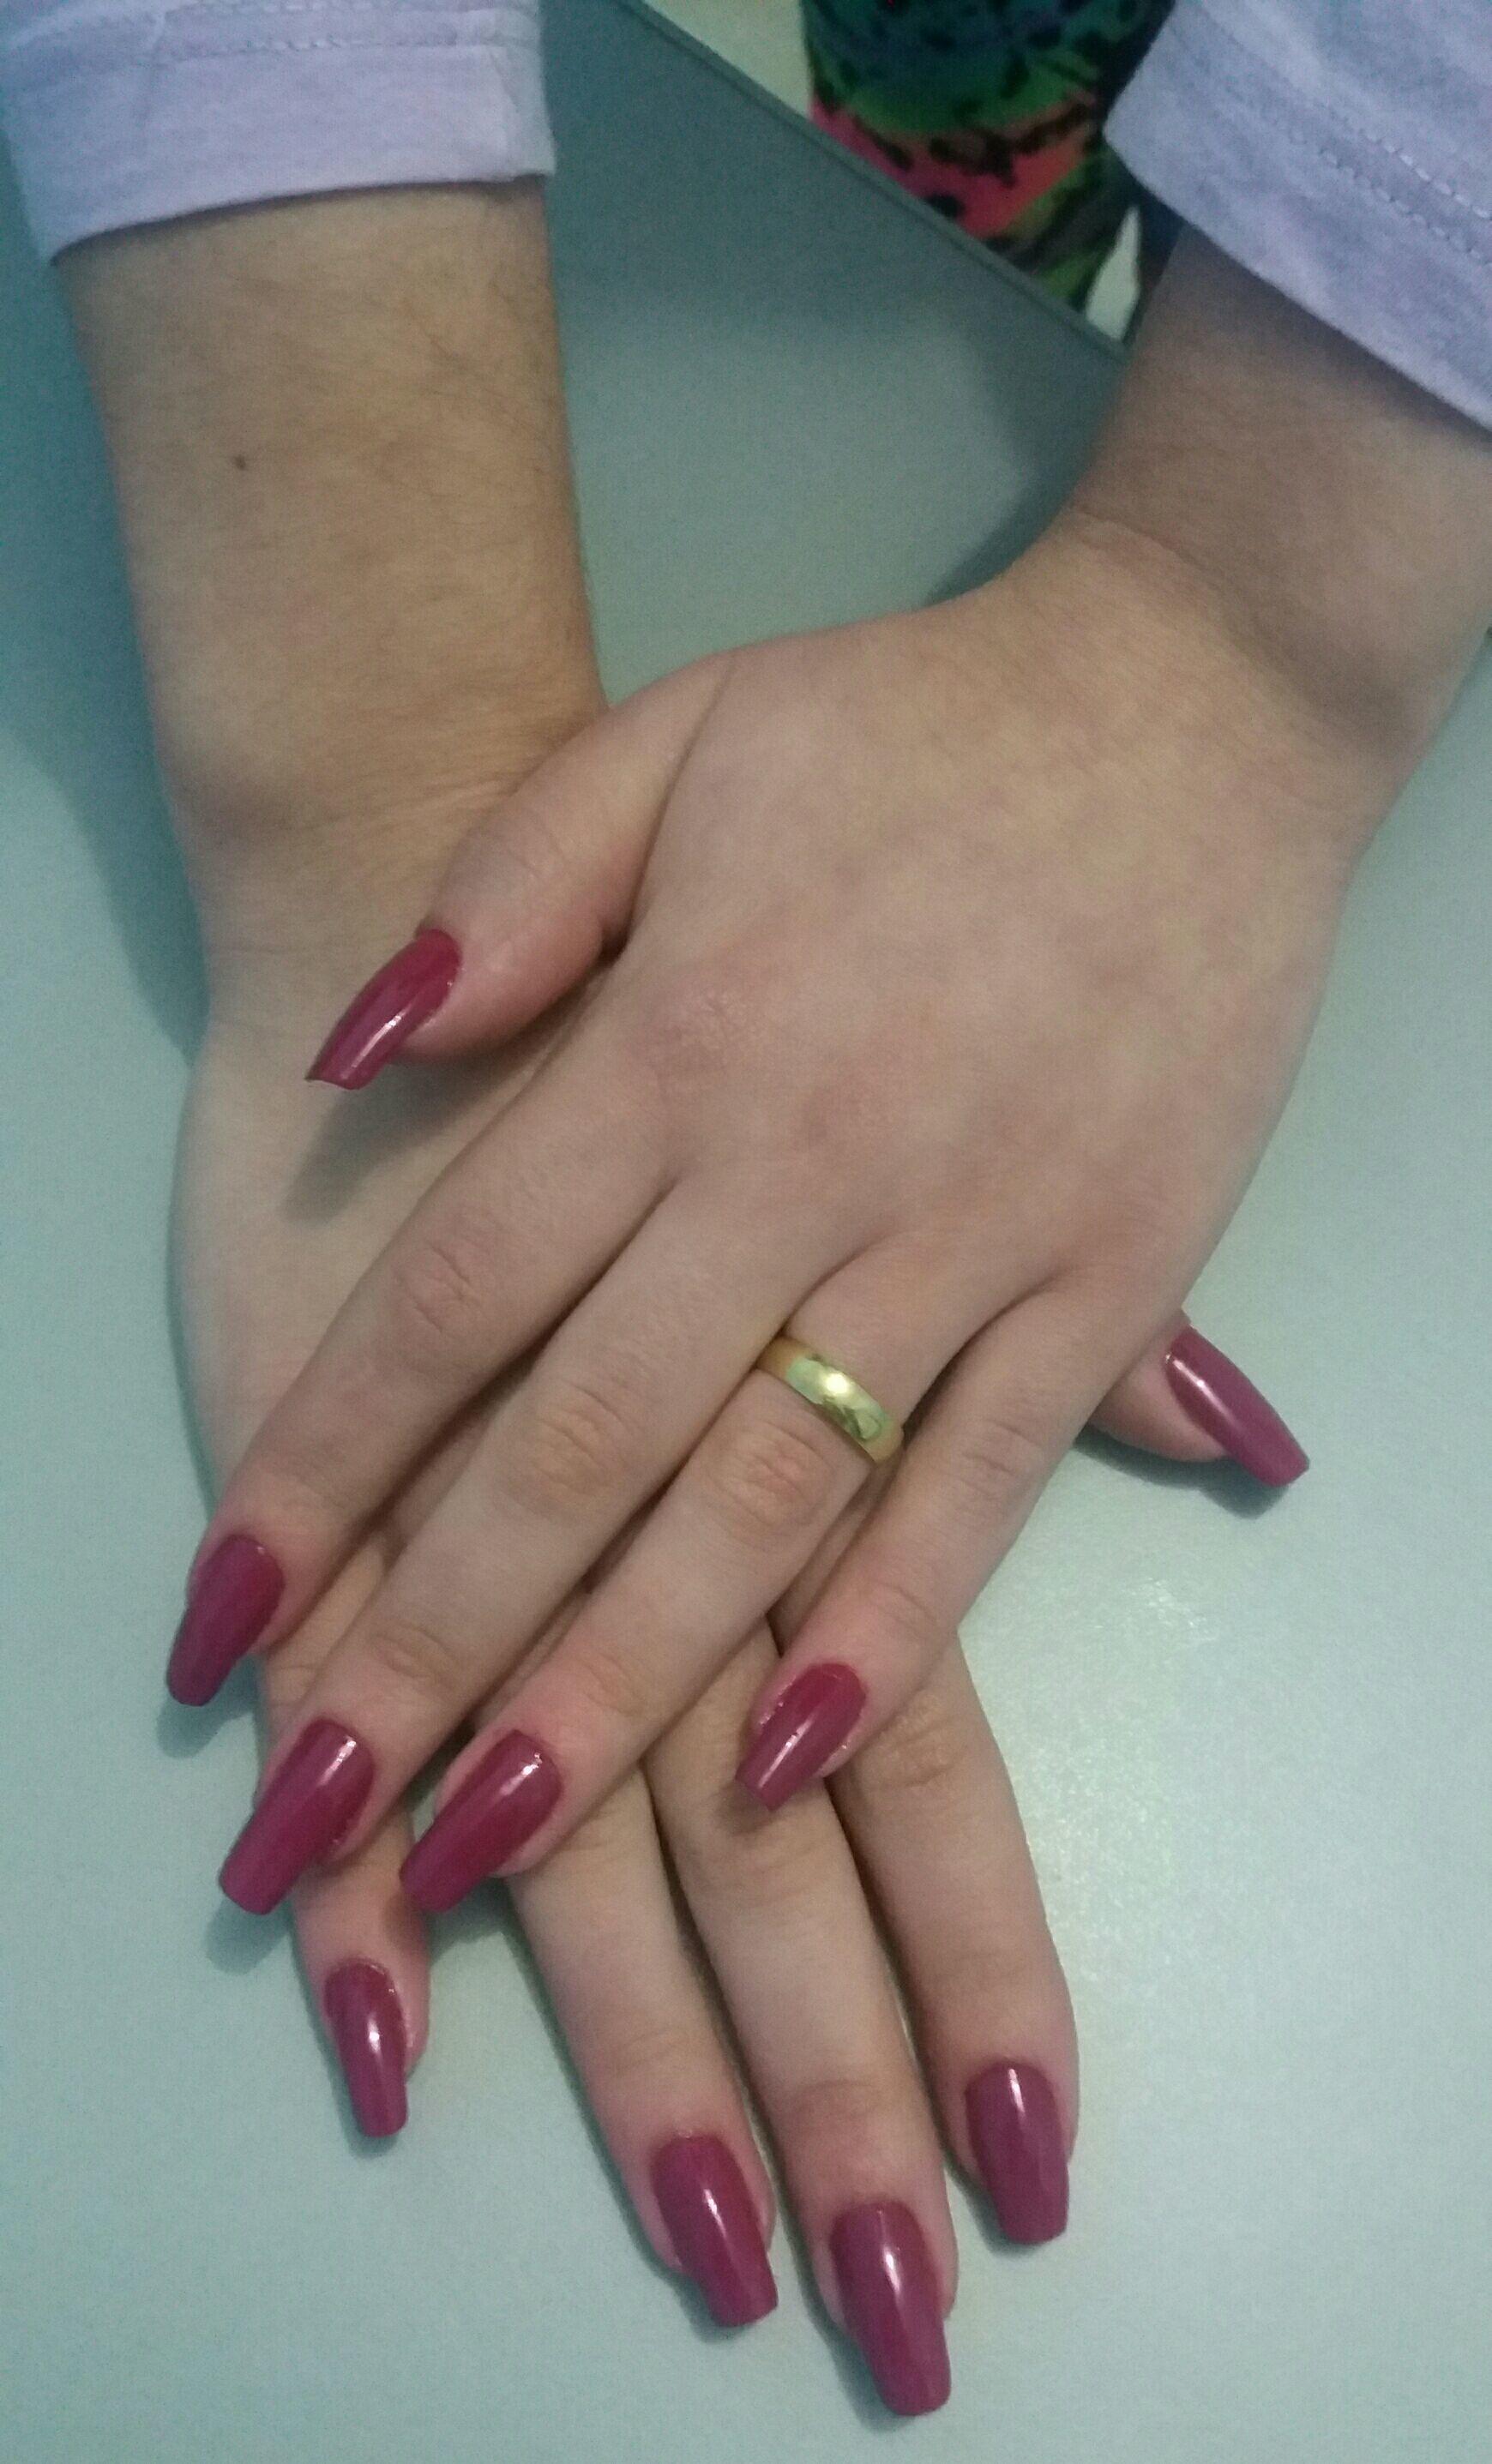 depilador(a) manicure e pedicure manicure e pedicure